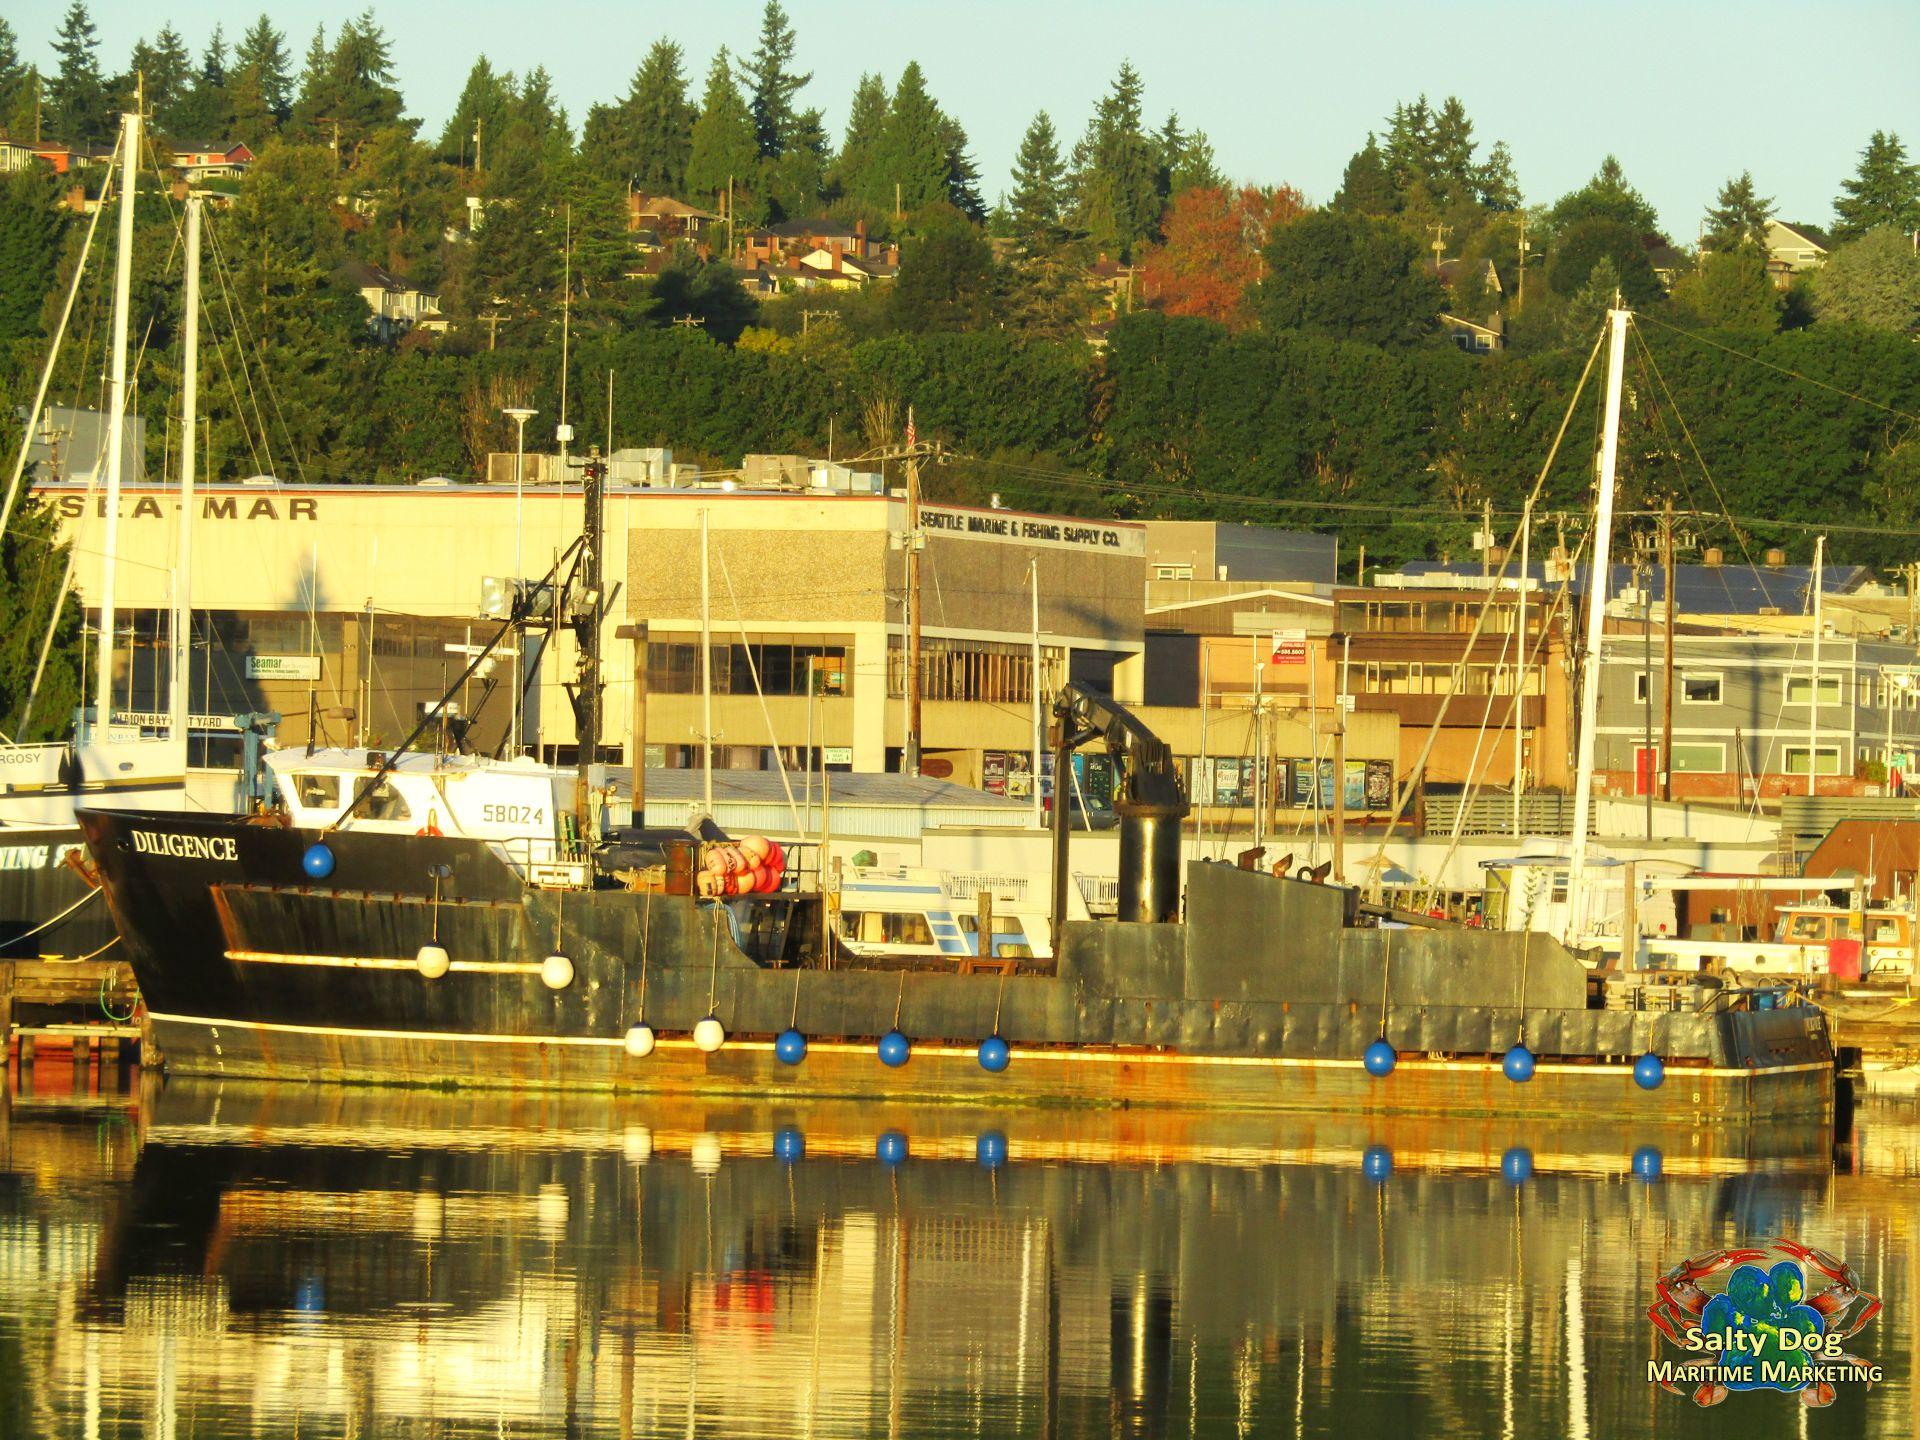 AK Bristol Bay Salmon Tenders FV Destination Trident